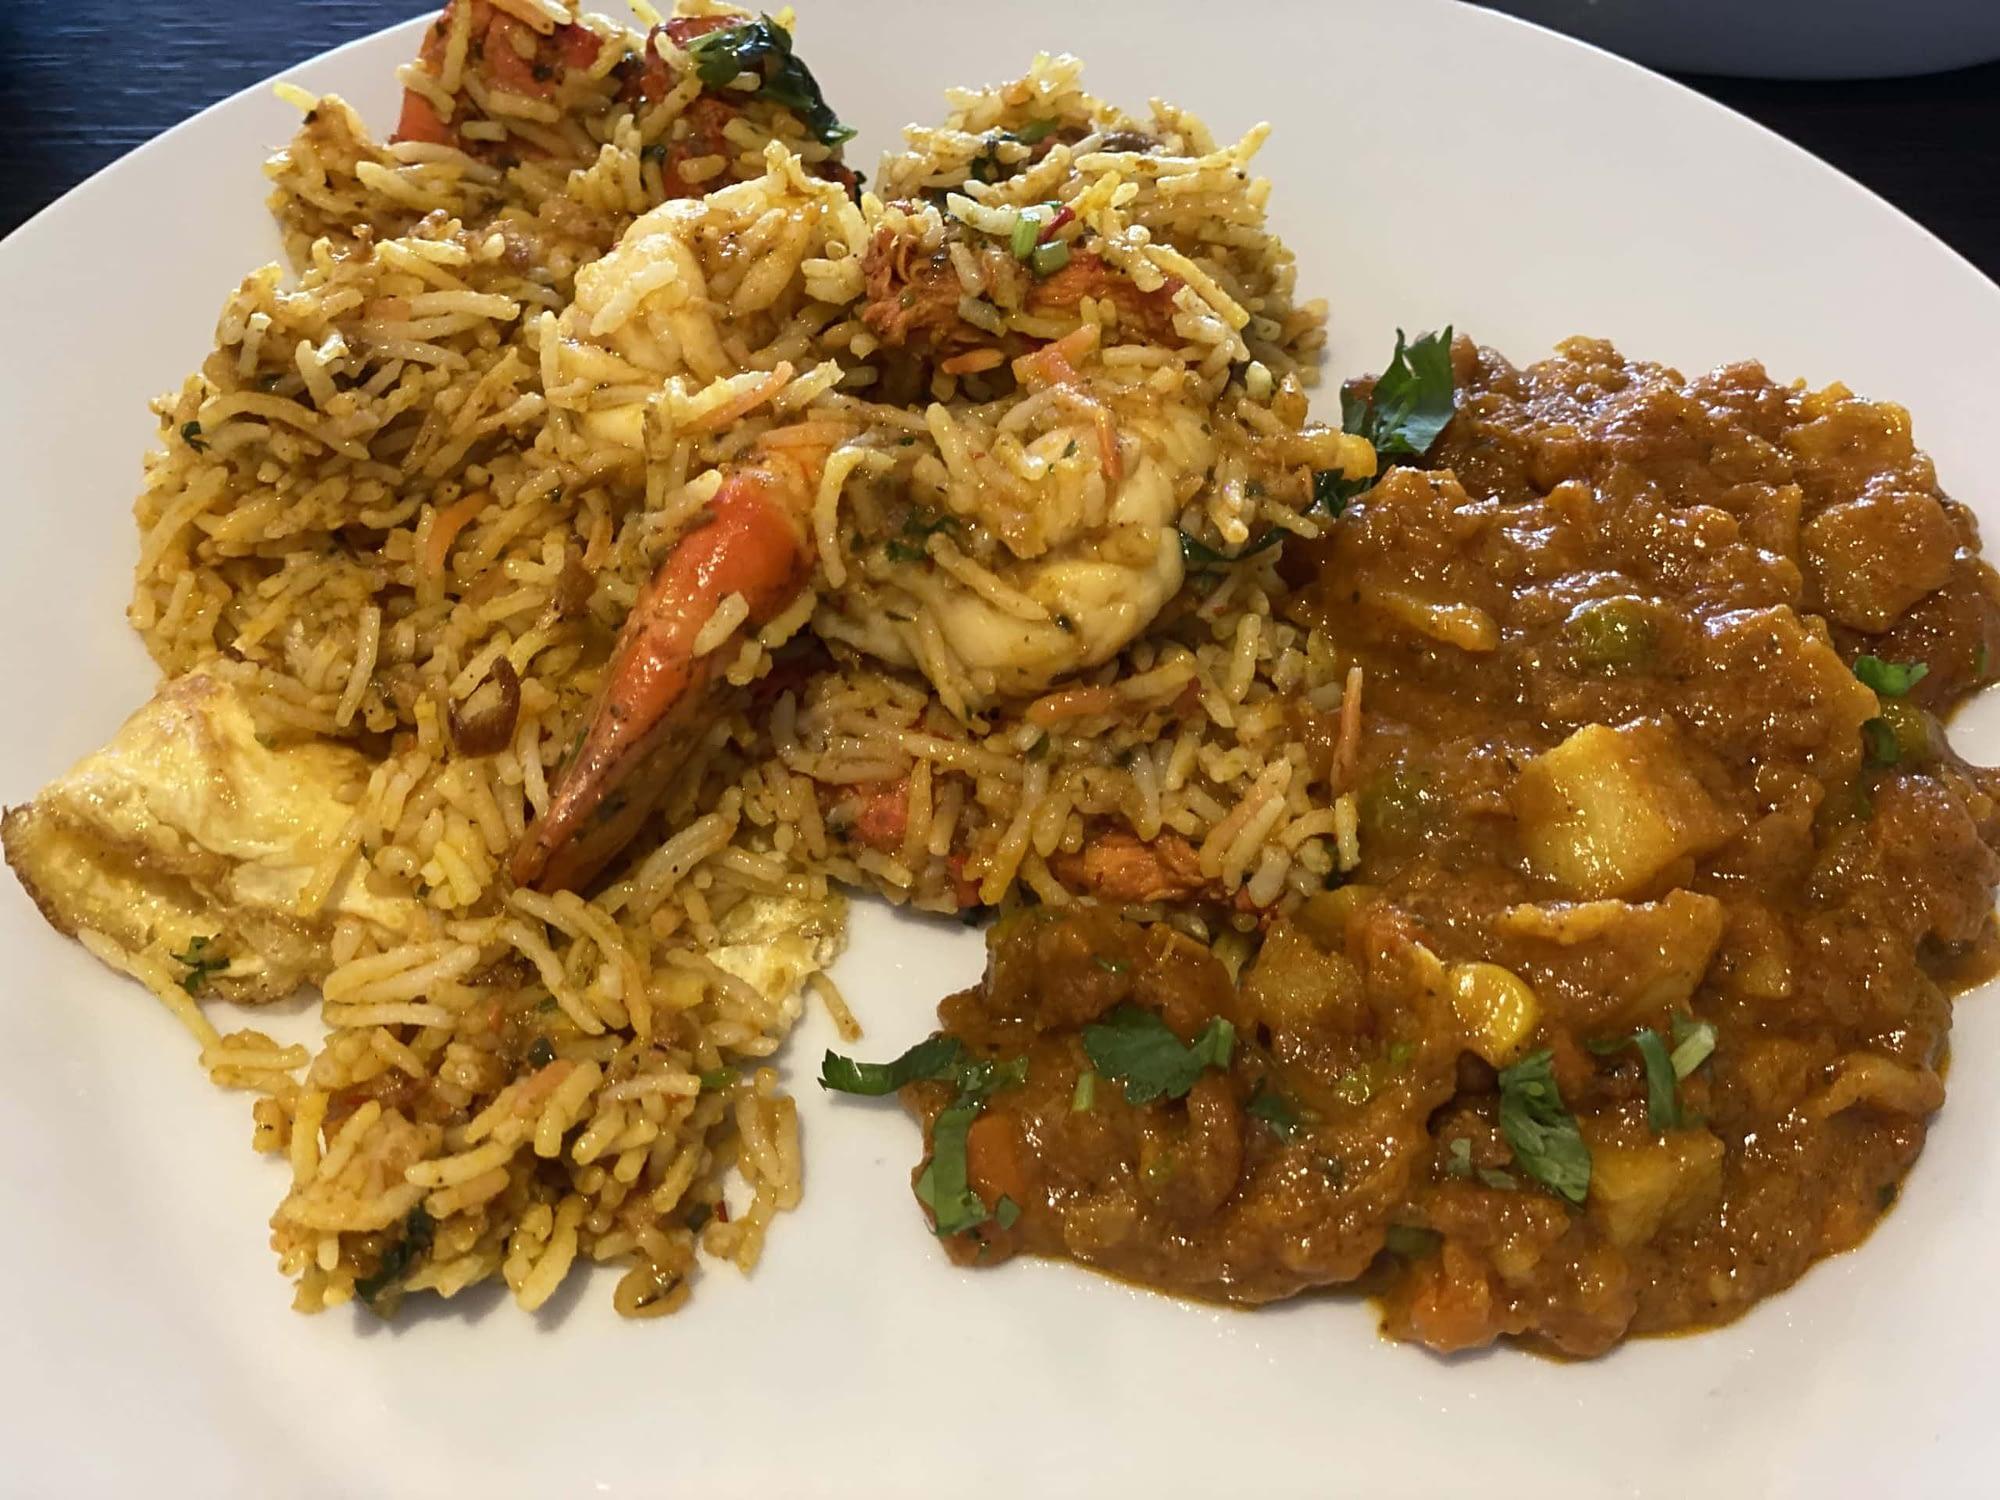 Rama Spice - Plated Biryani & Sauce